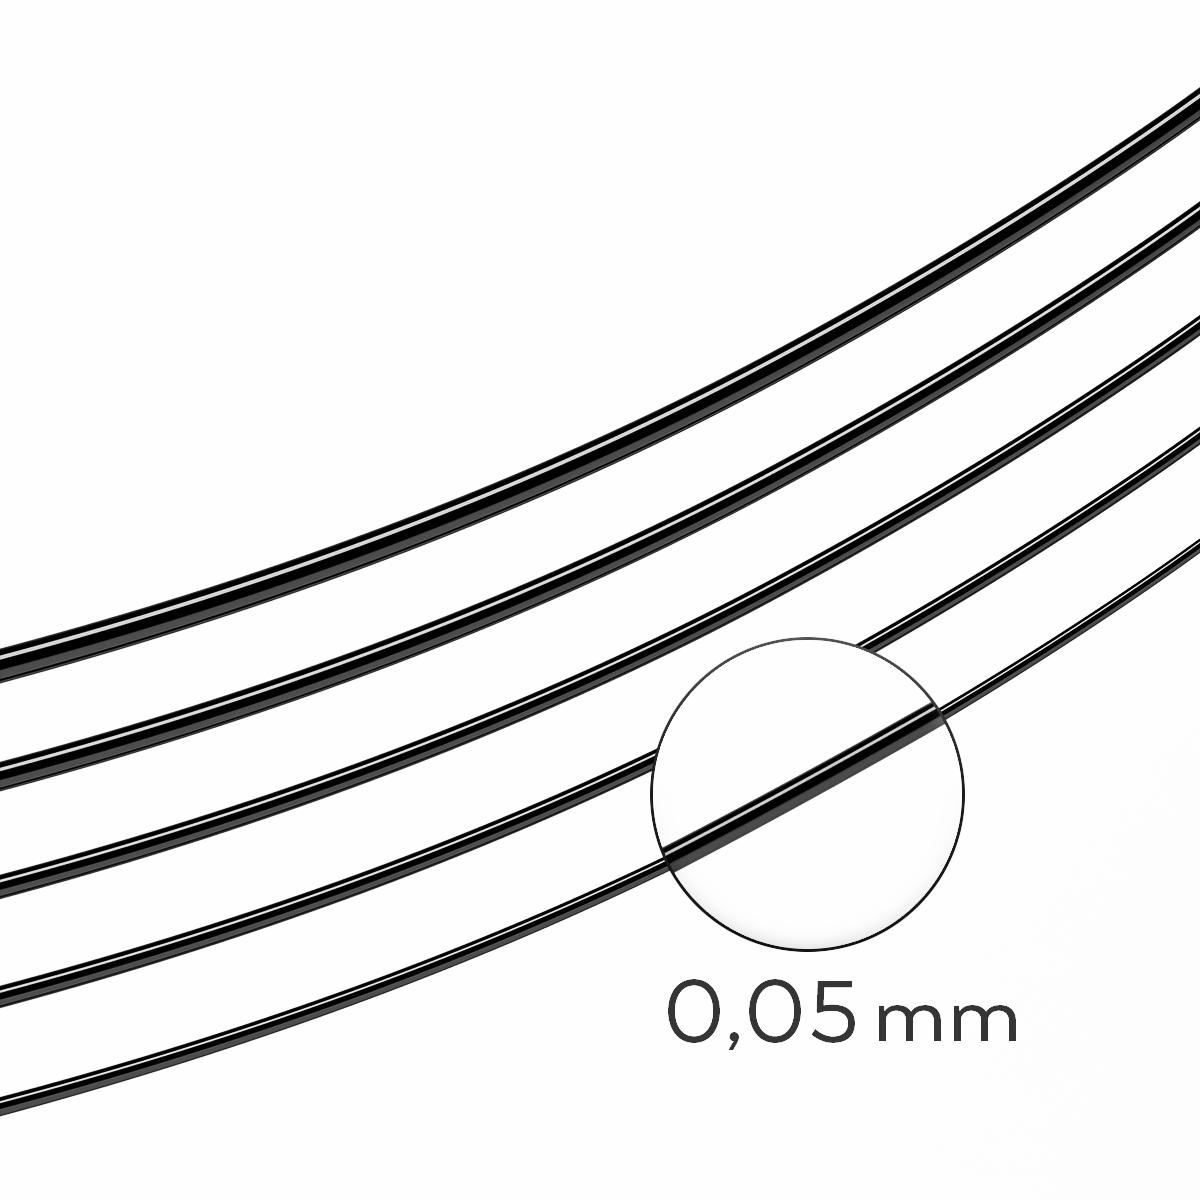 rzesy-objetosciowe-silk-black-l-0-05